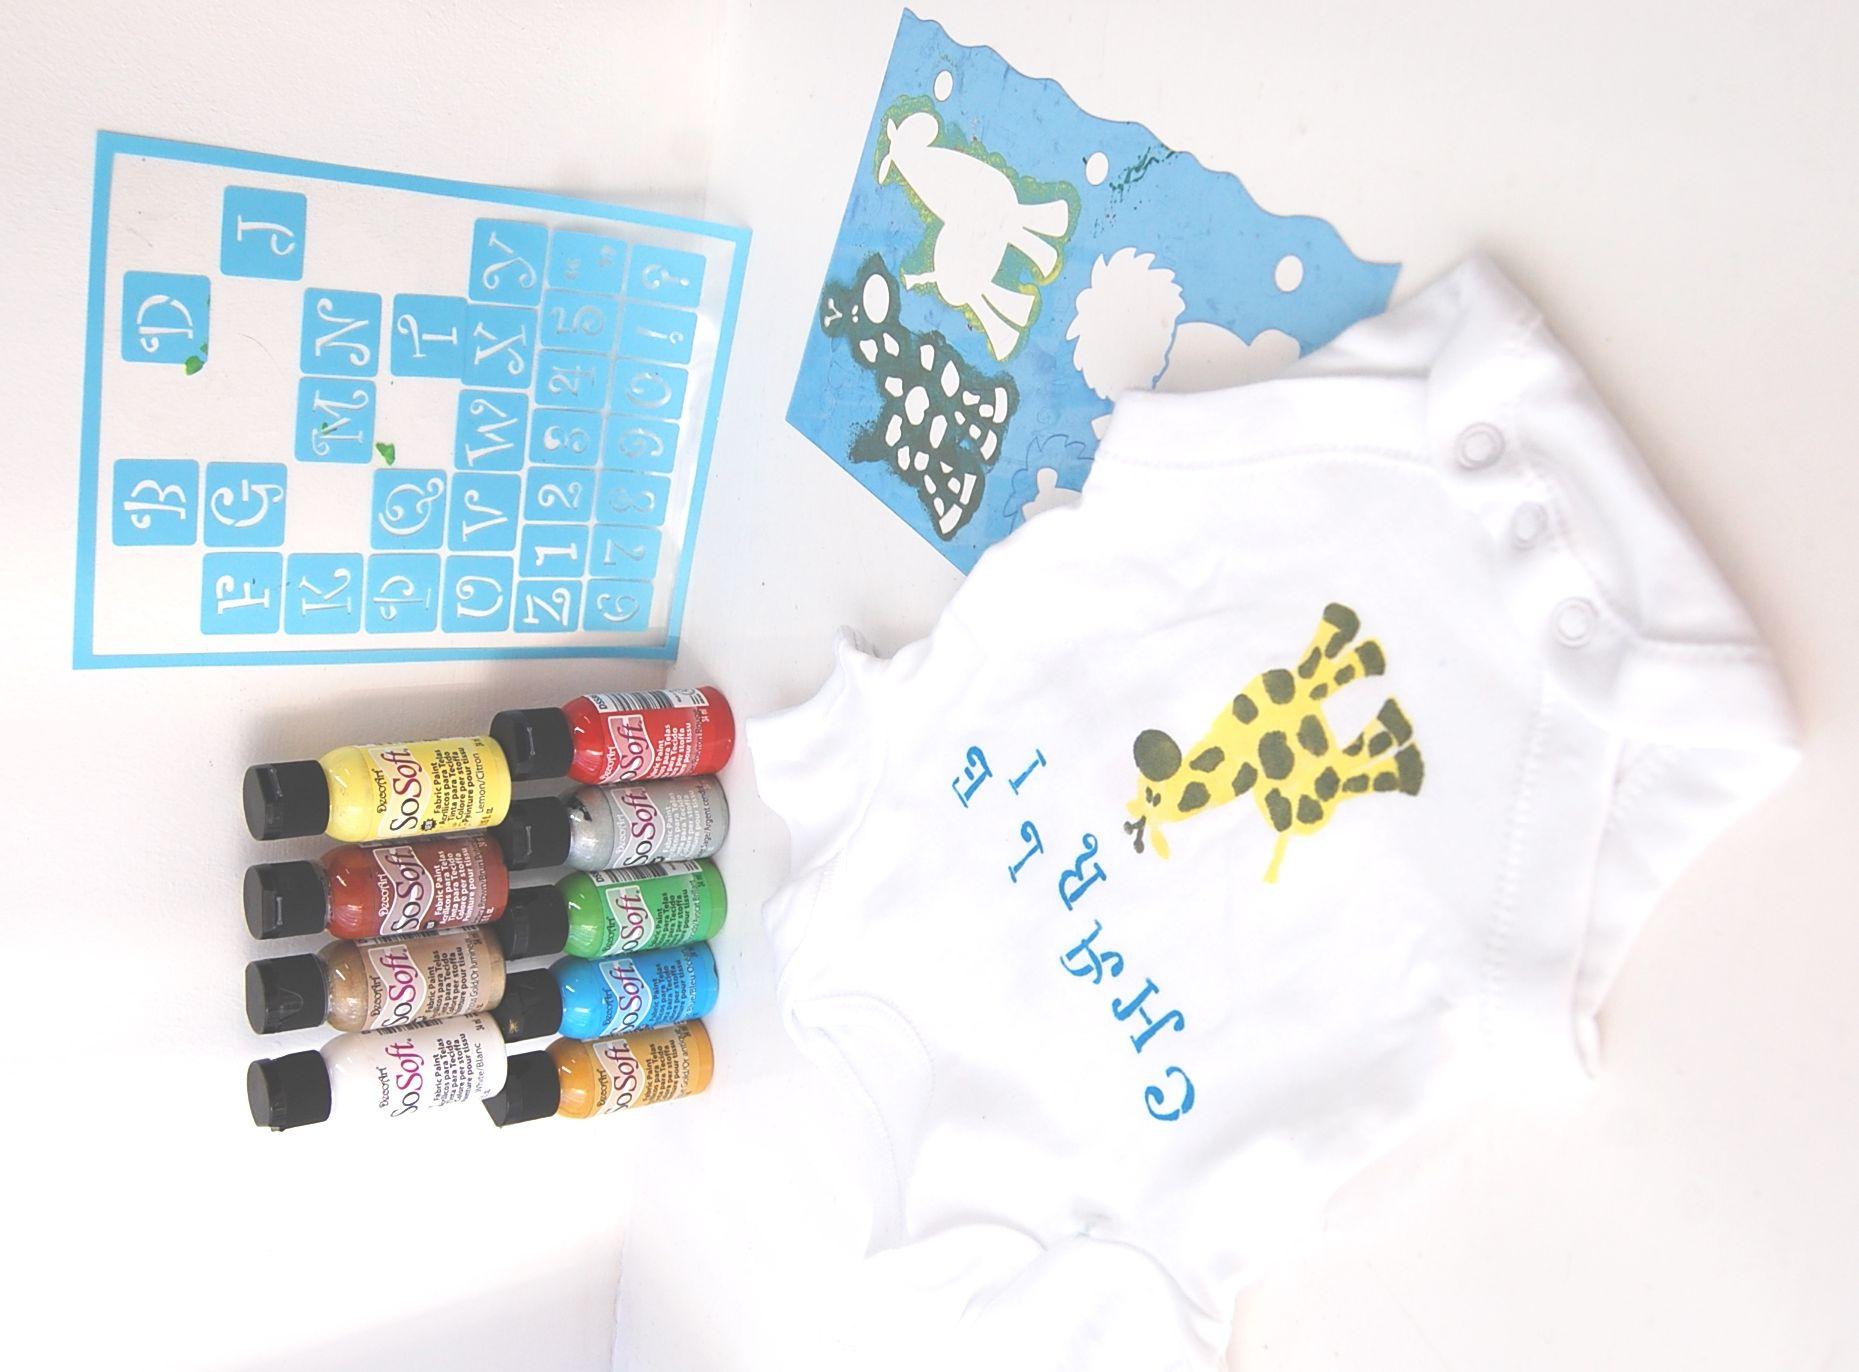 Stencil On Cotton Material Baby Onsie Using Fabric Paints By Decoart Sosoft Alphabet Stencils Stencil Diy Stencil Crafts